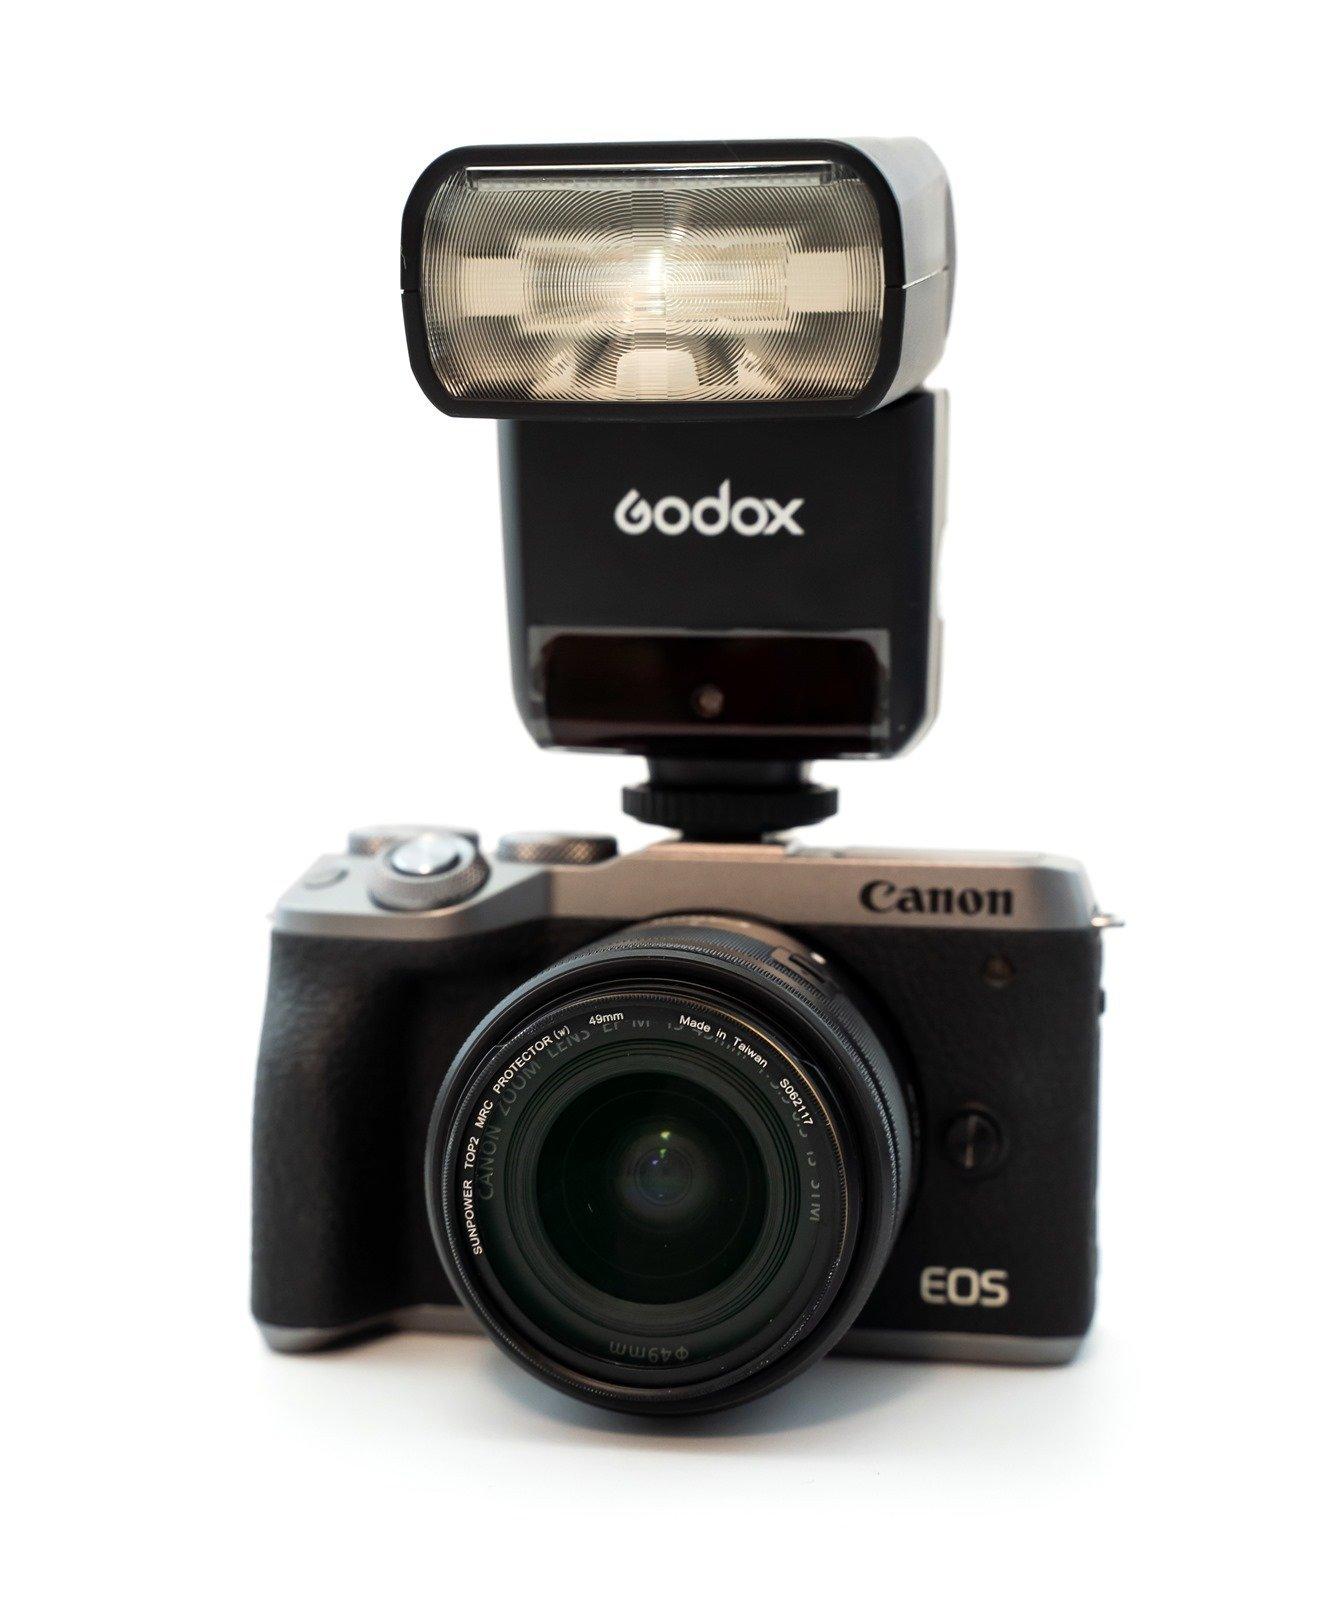 Canon EOS M6 Mark II 入手開箱分享,還有與 M6 比較 / TT350C 閃光燈相容性問題 @3C 達人廖阿輝